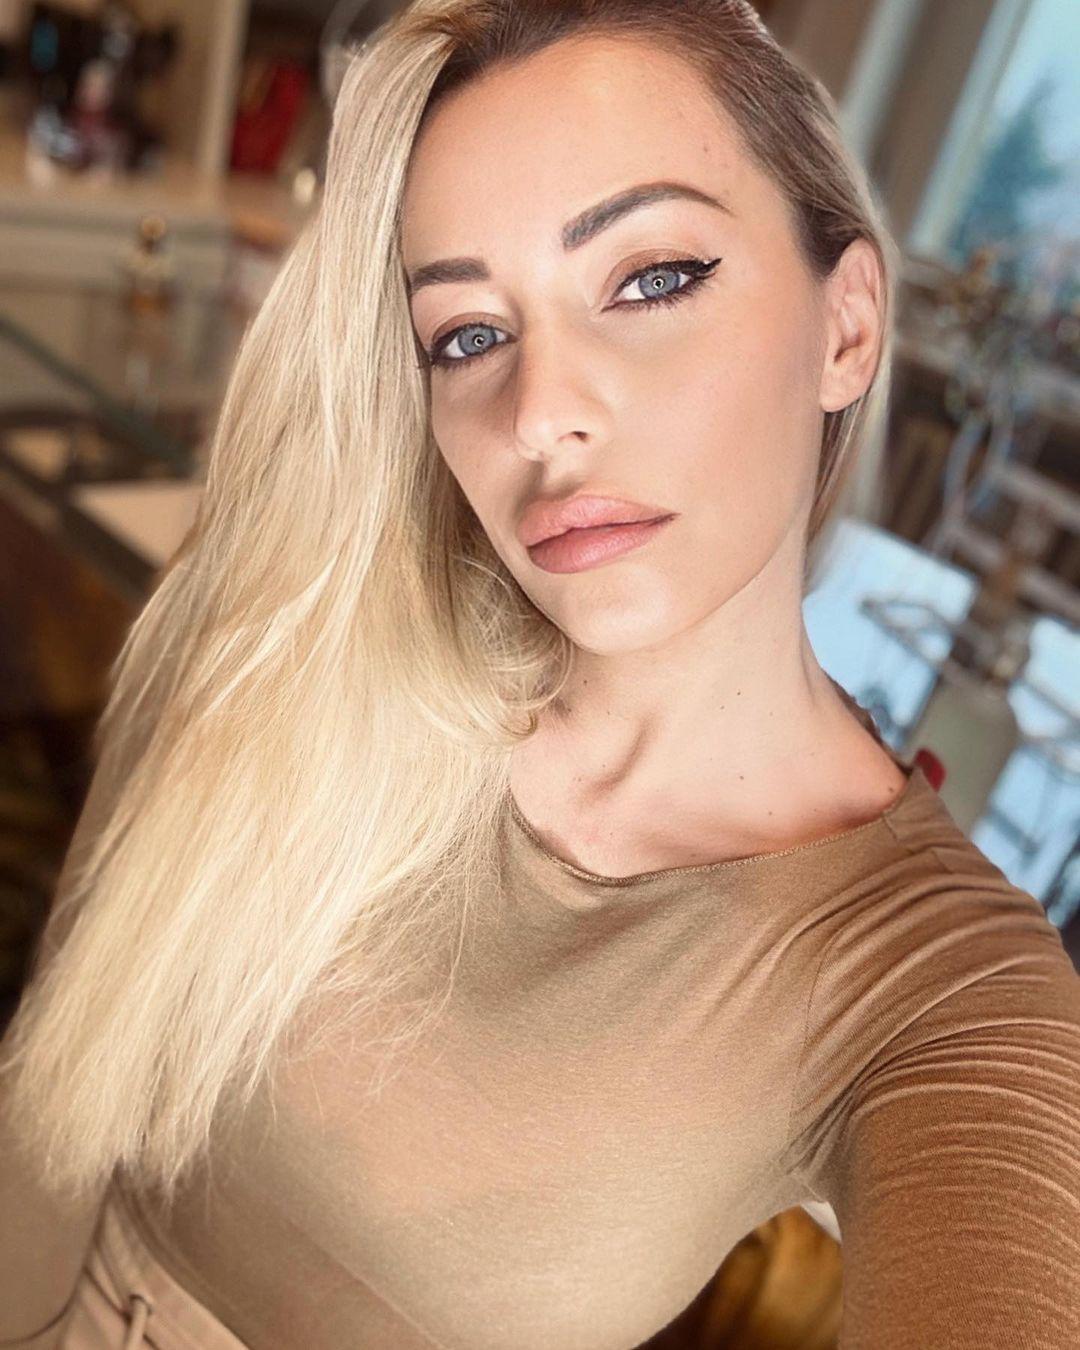 Karina-Cascella-Wallpapers-Insta-Fit-Bio-5